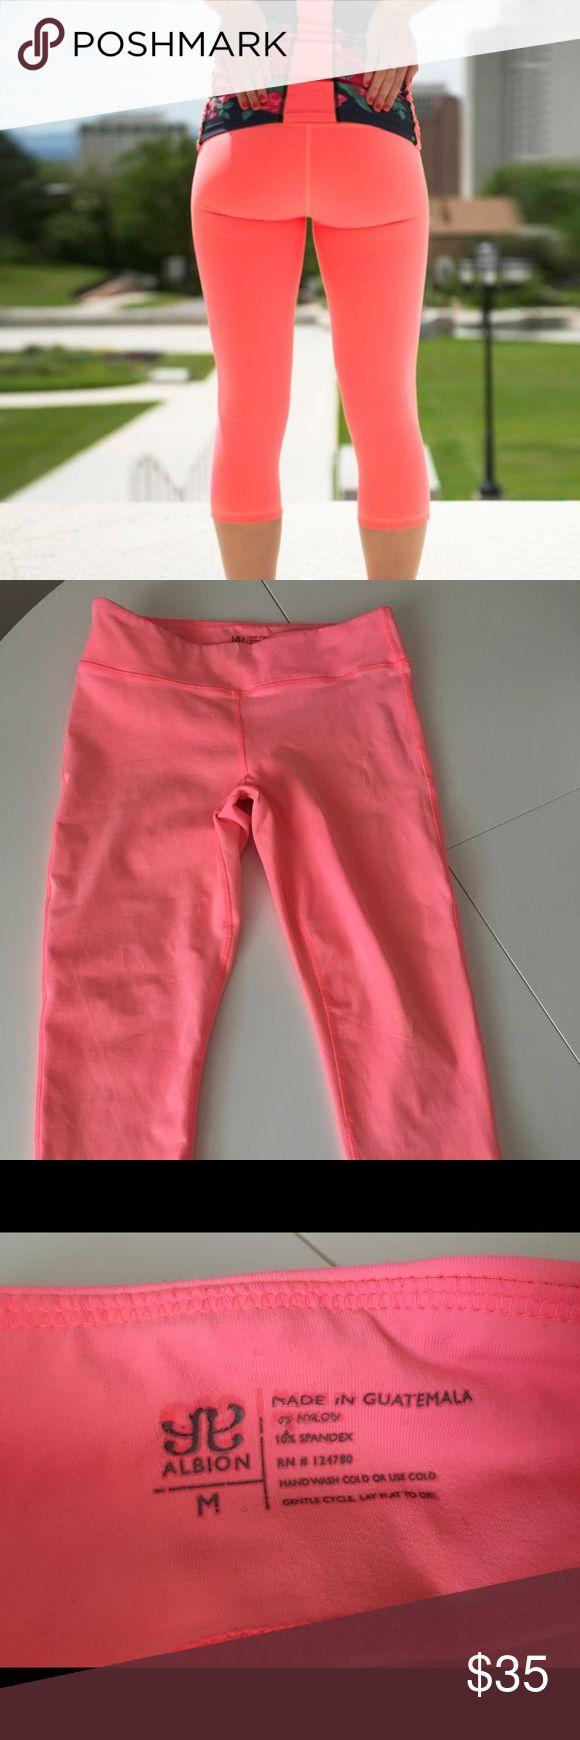 Albion fit go coral capris Size medium, worn just a couple of times. Pink orange color. Albion fit. albion fit Pants Leggings